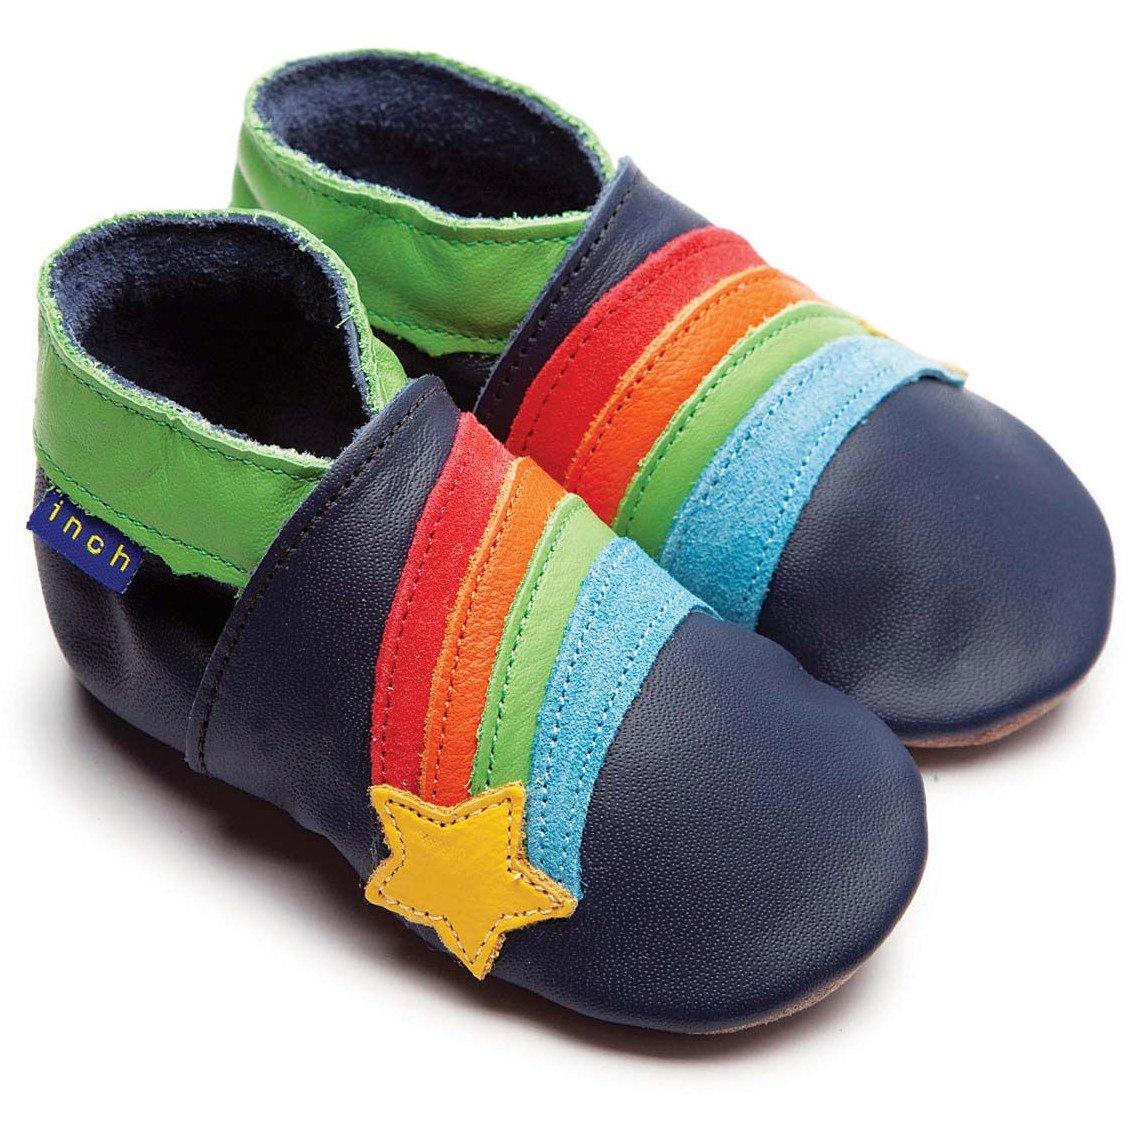 Inch Blue Boys Baby Luxury Leather Soft Sole Pram Shoes - Rainbow Star Navy